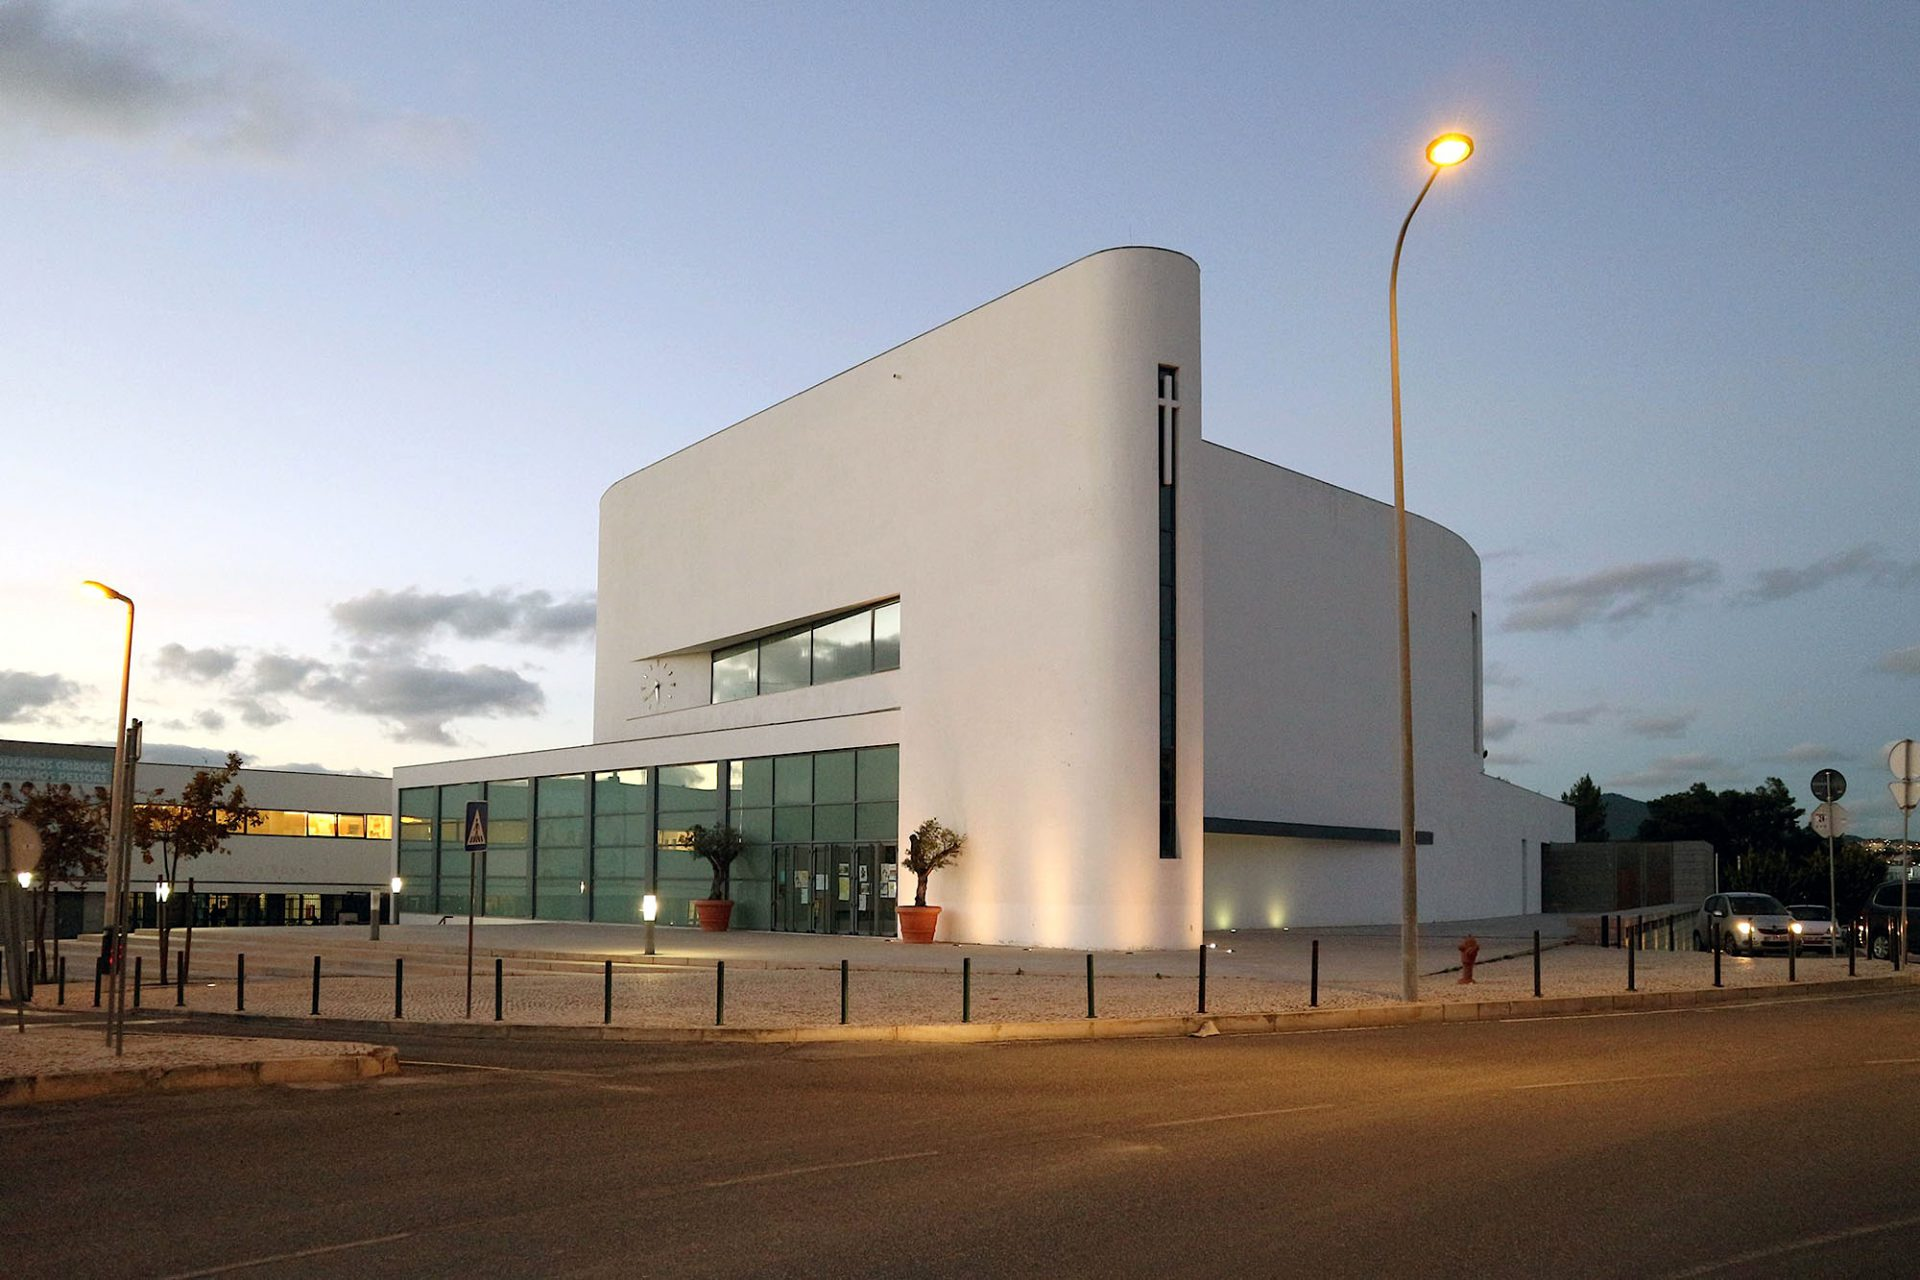 Kirche Senhora da Boa Nova. Entworfen von Roseta Vaz Monteiro, Fertigstellung 2009